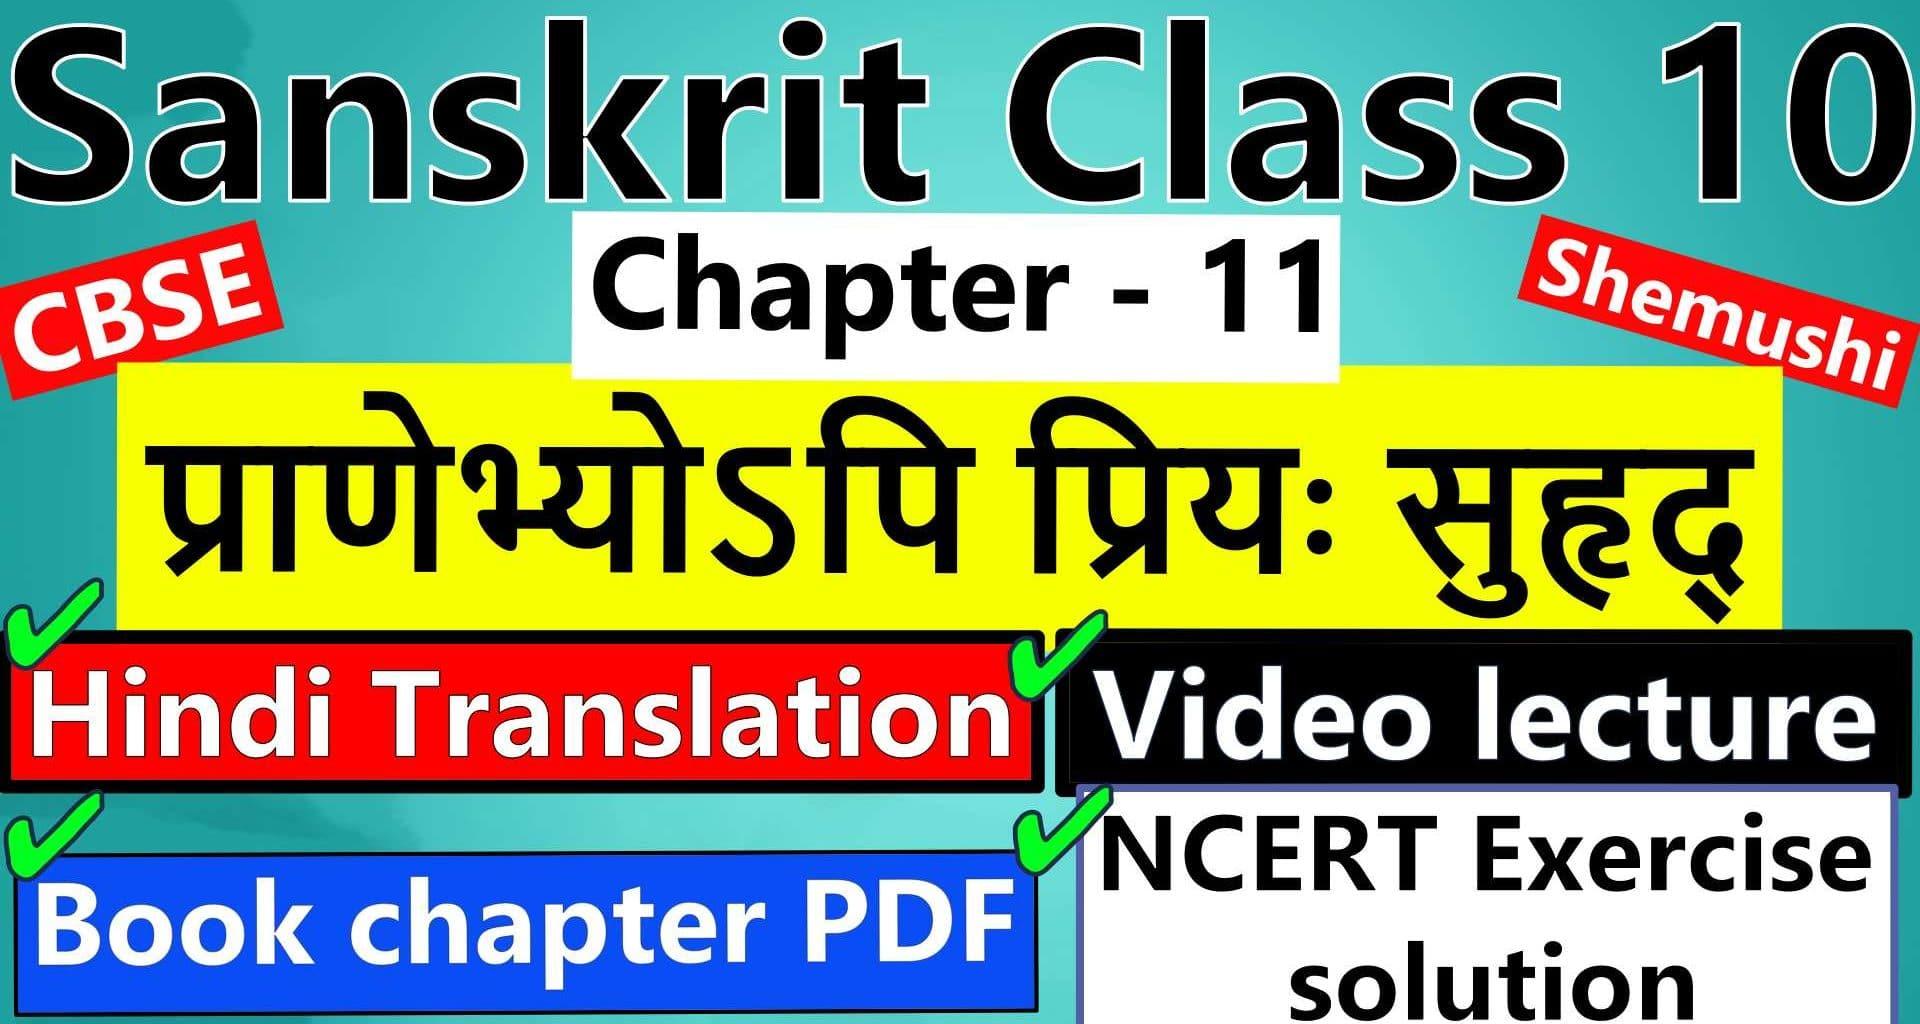 sanskrit-class-10-chapter-11-प्राणेभ्योऽपि-प्रियः-सुहृद्-Hindi-Translation-Video-lecture-NCERT-Exercise-Solution-Question-Answer-Book-chapter-PDF